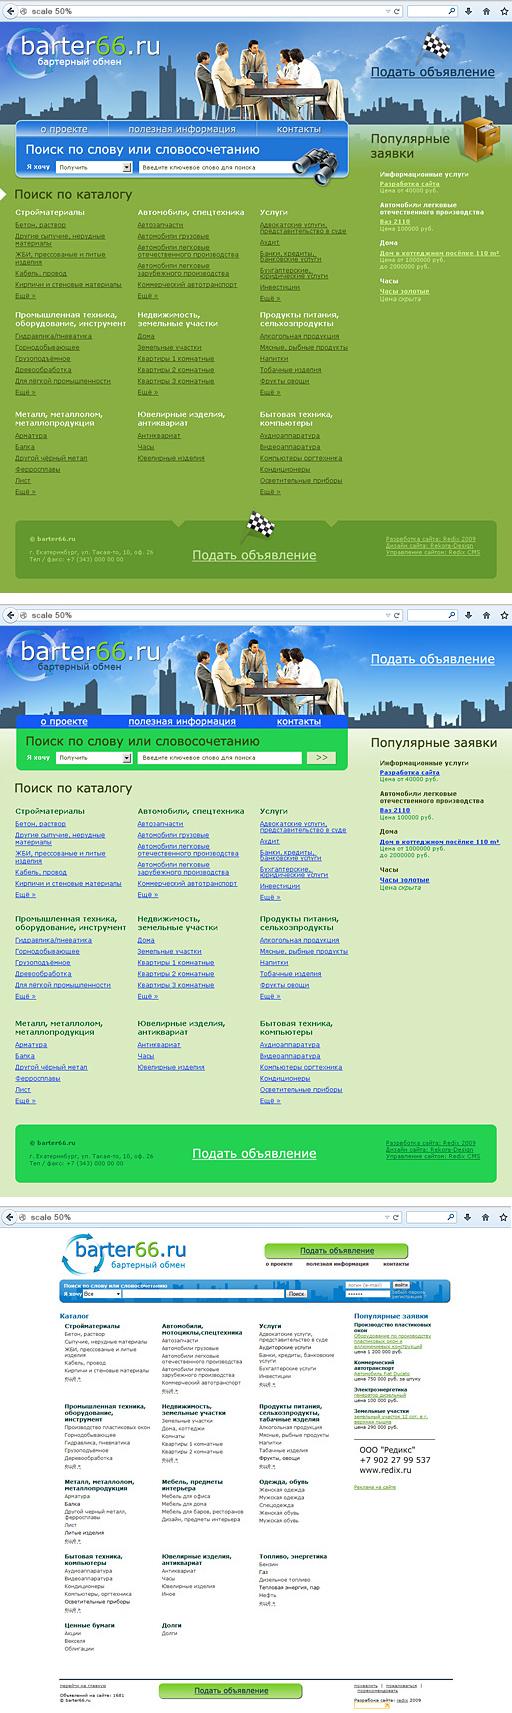 2009 - «Barter66.ru» - тематический каталог услуг